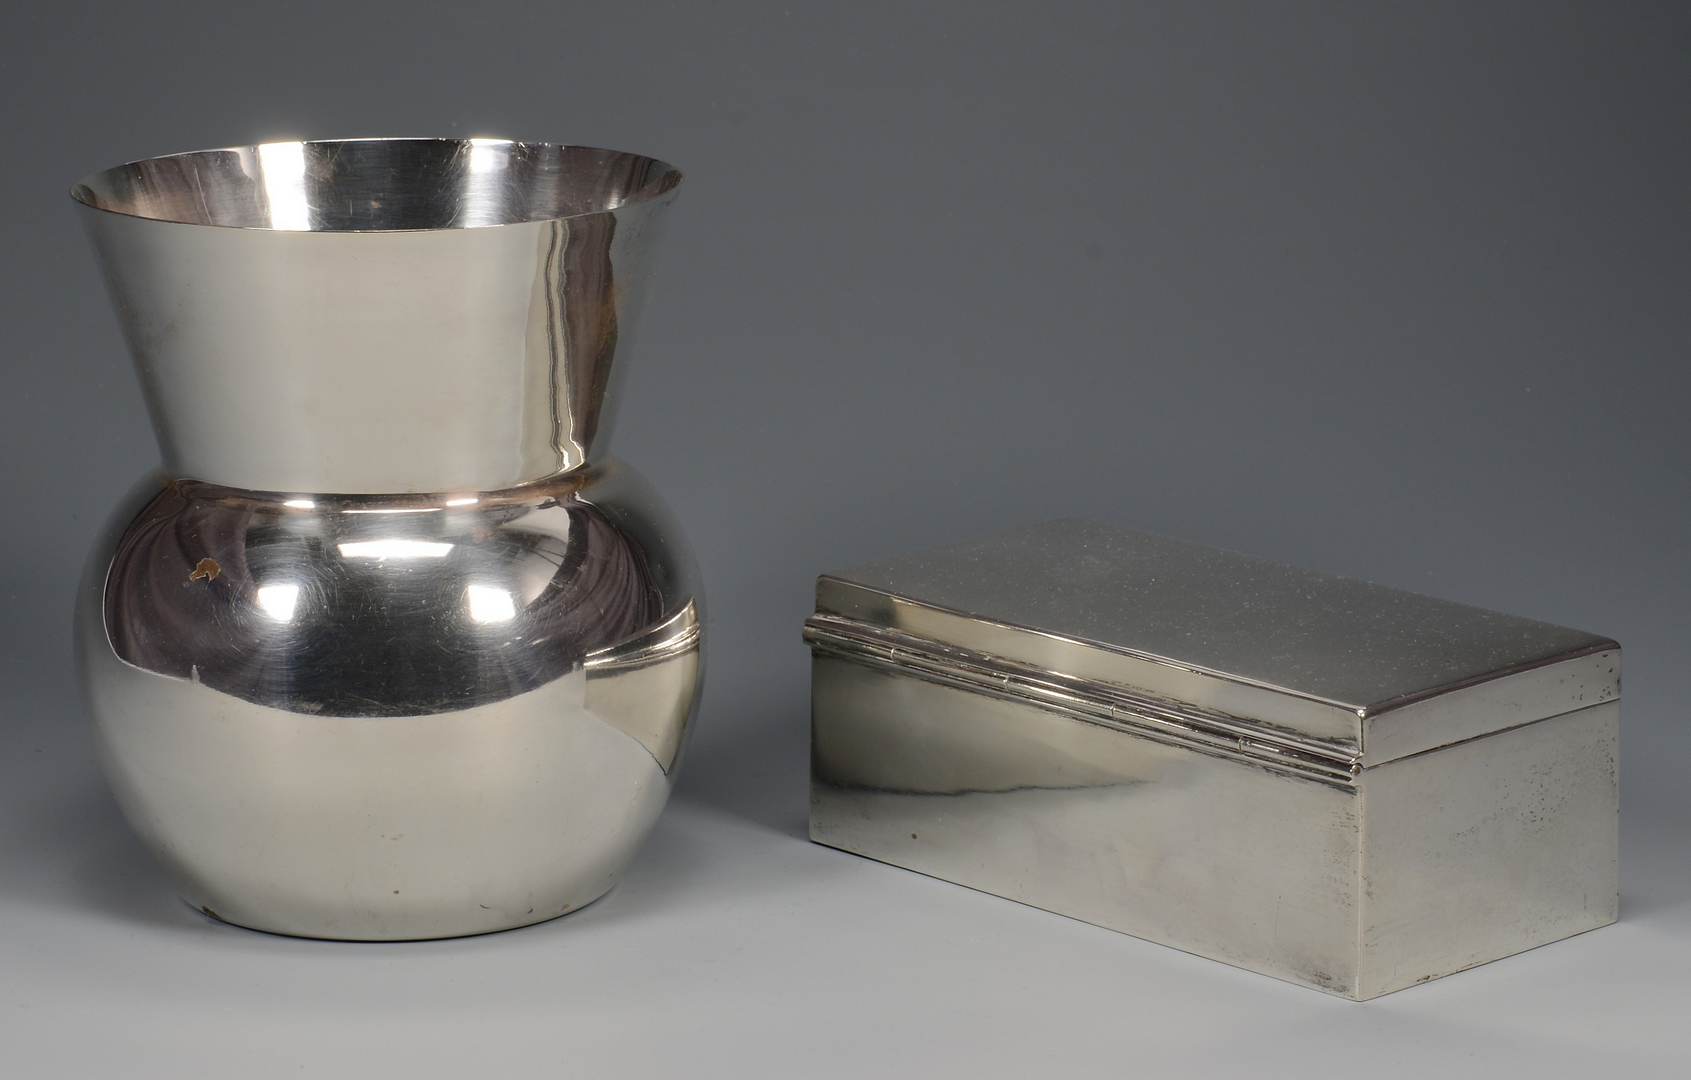 Lot 784: 5 Assd. Silver Serving Items